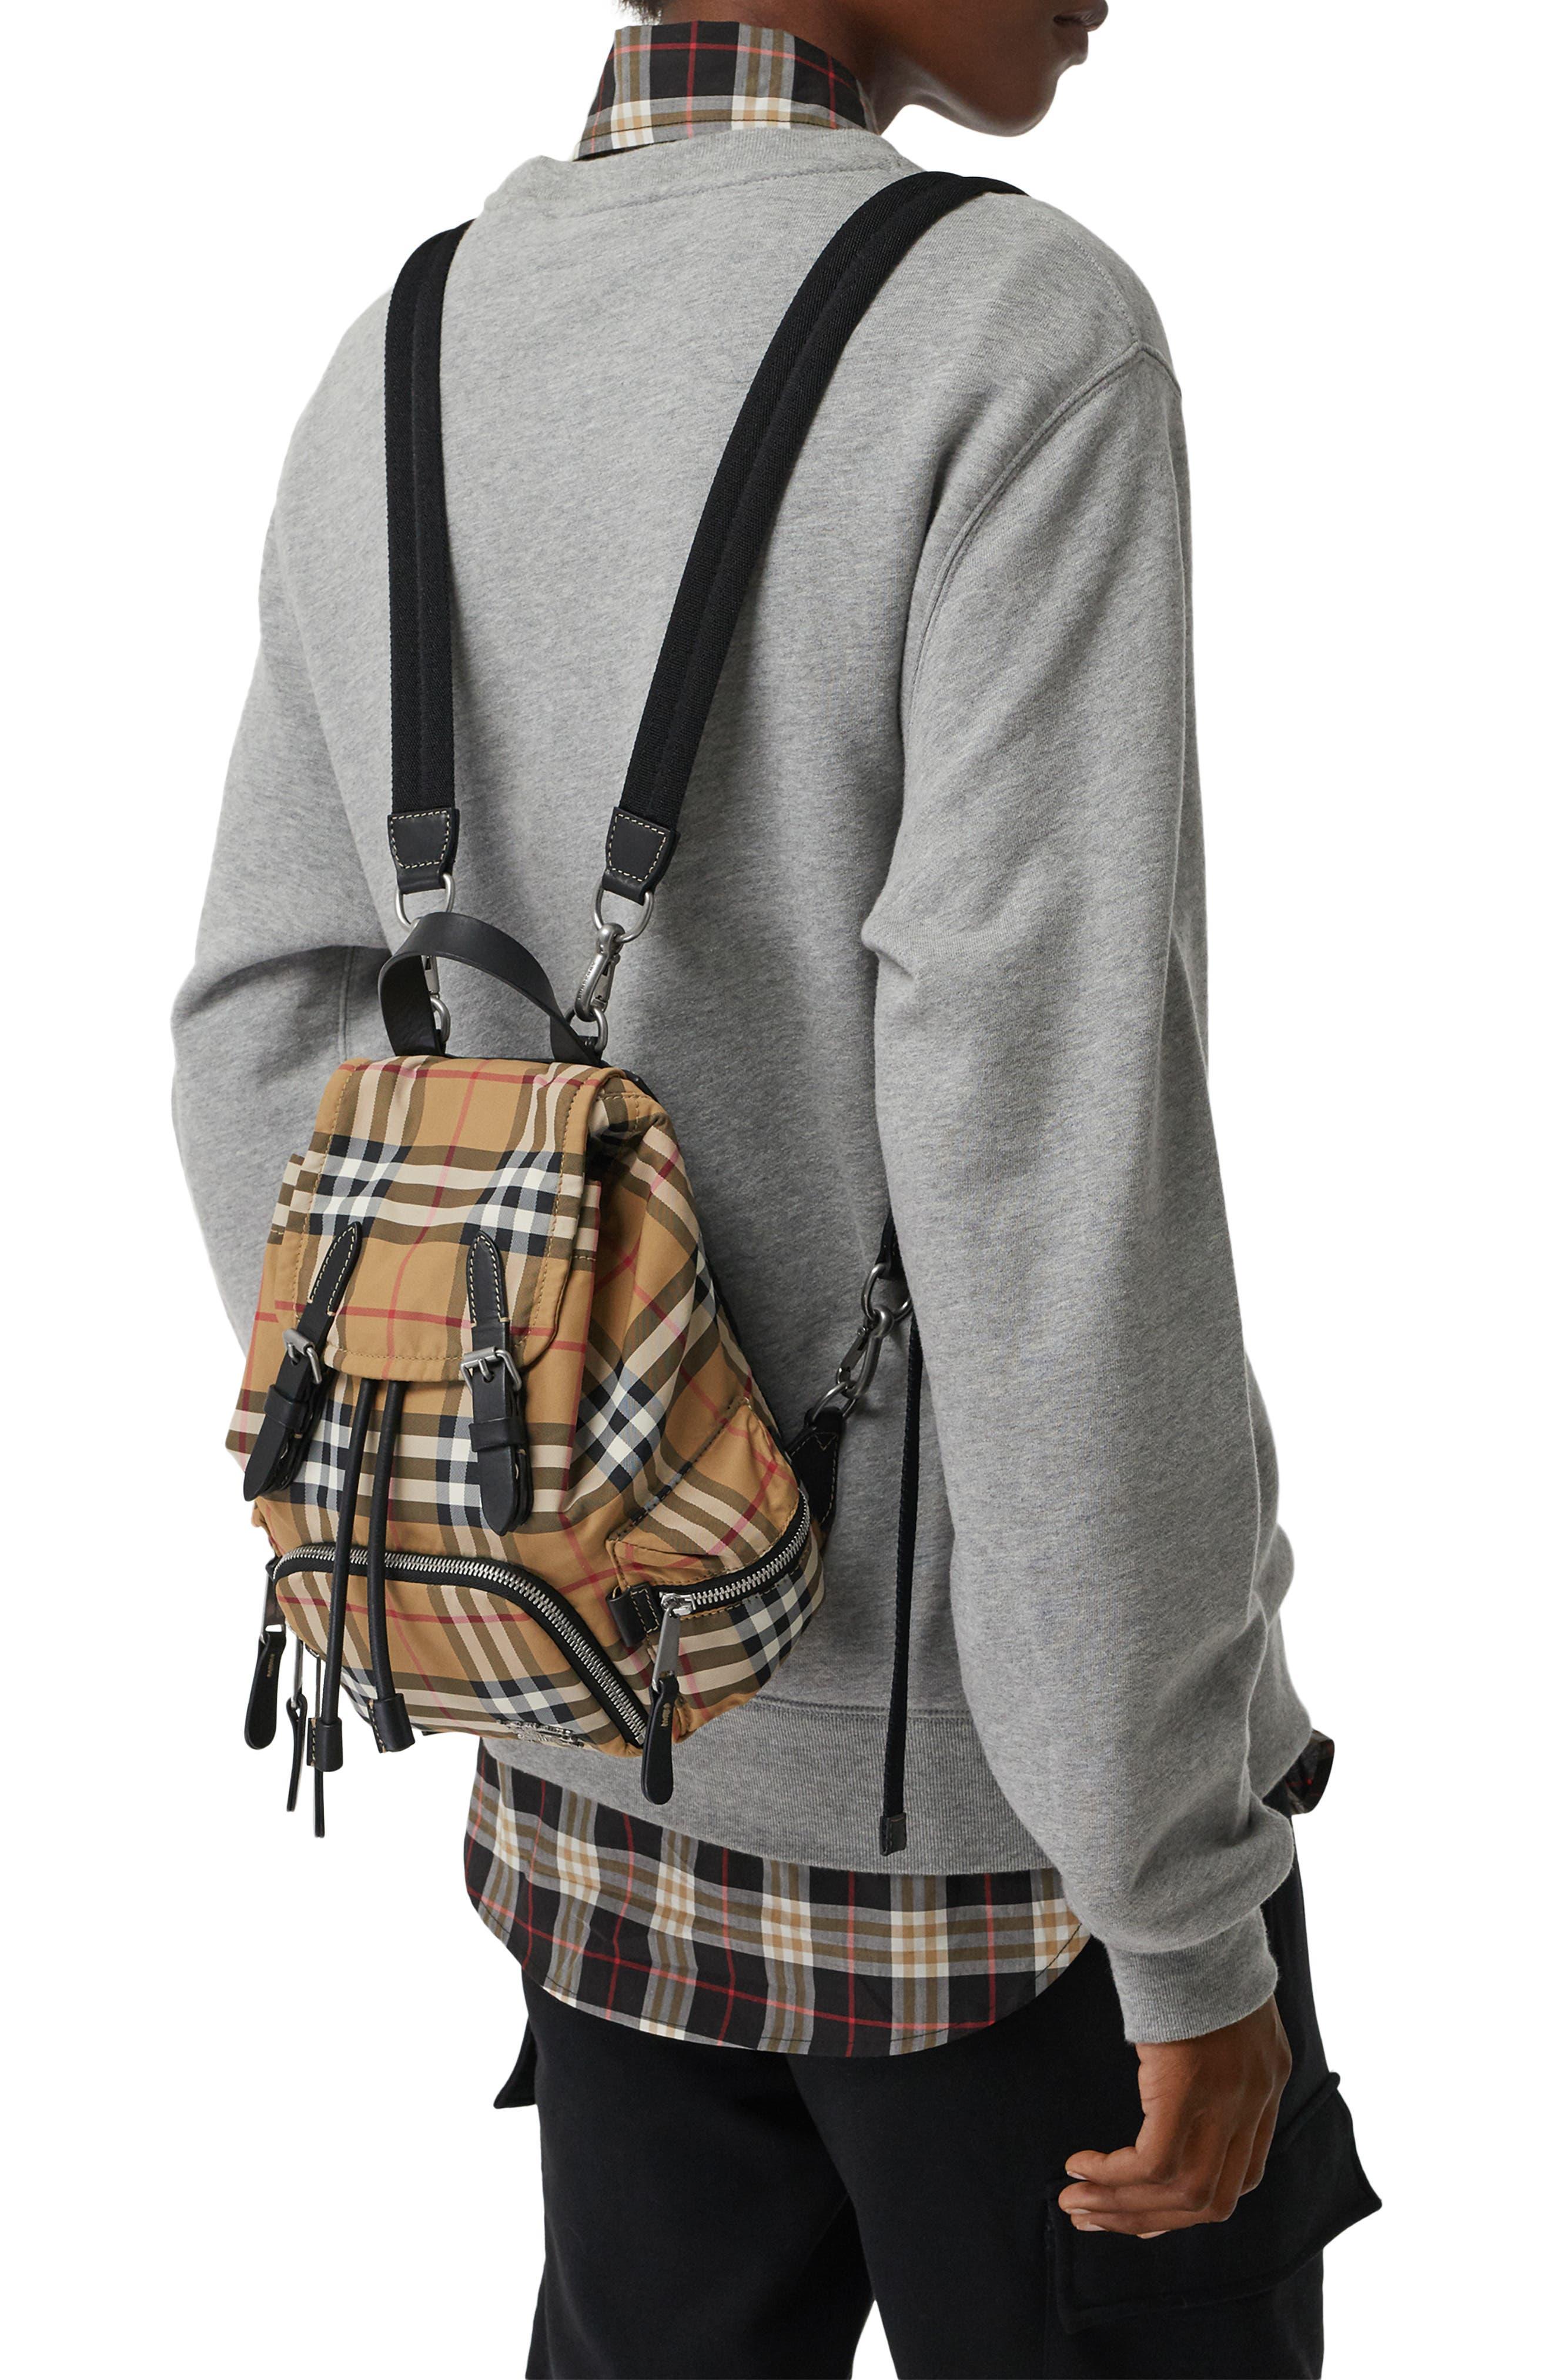 Small Rucksack Vintage Check Nylon Backpack,                             Alternate thumbnail 2, color,                             ANTIQUE YELLOW/ BLACK